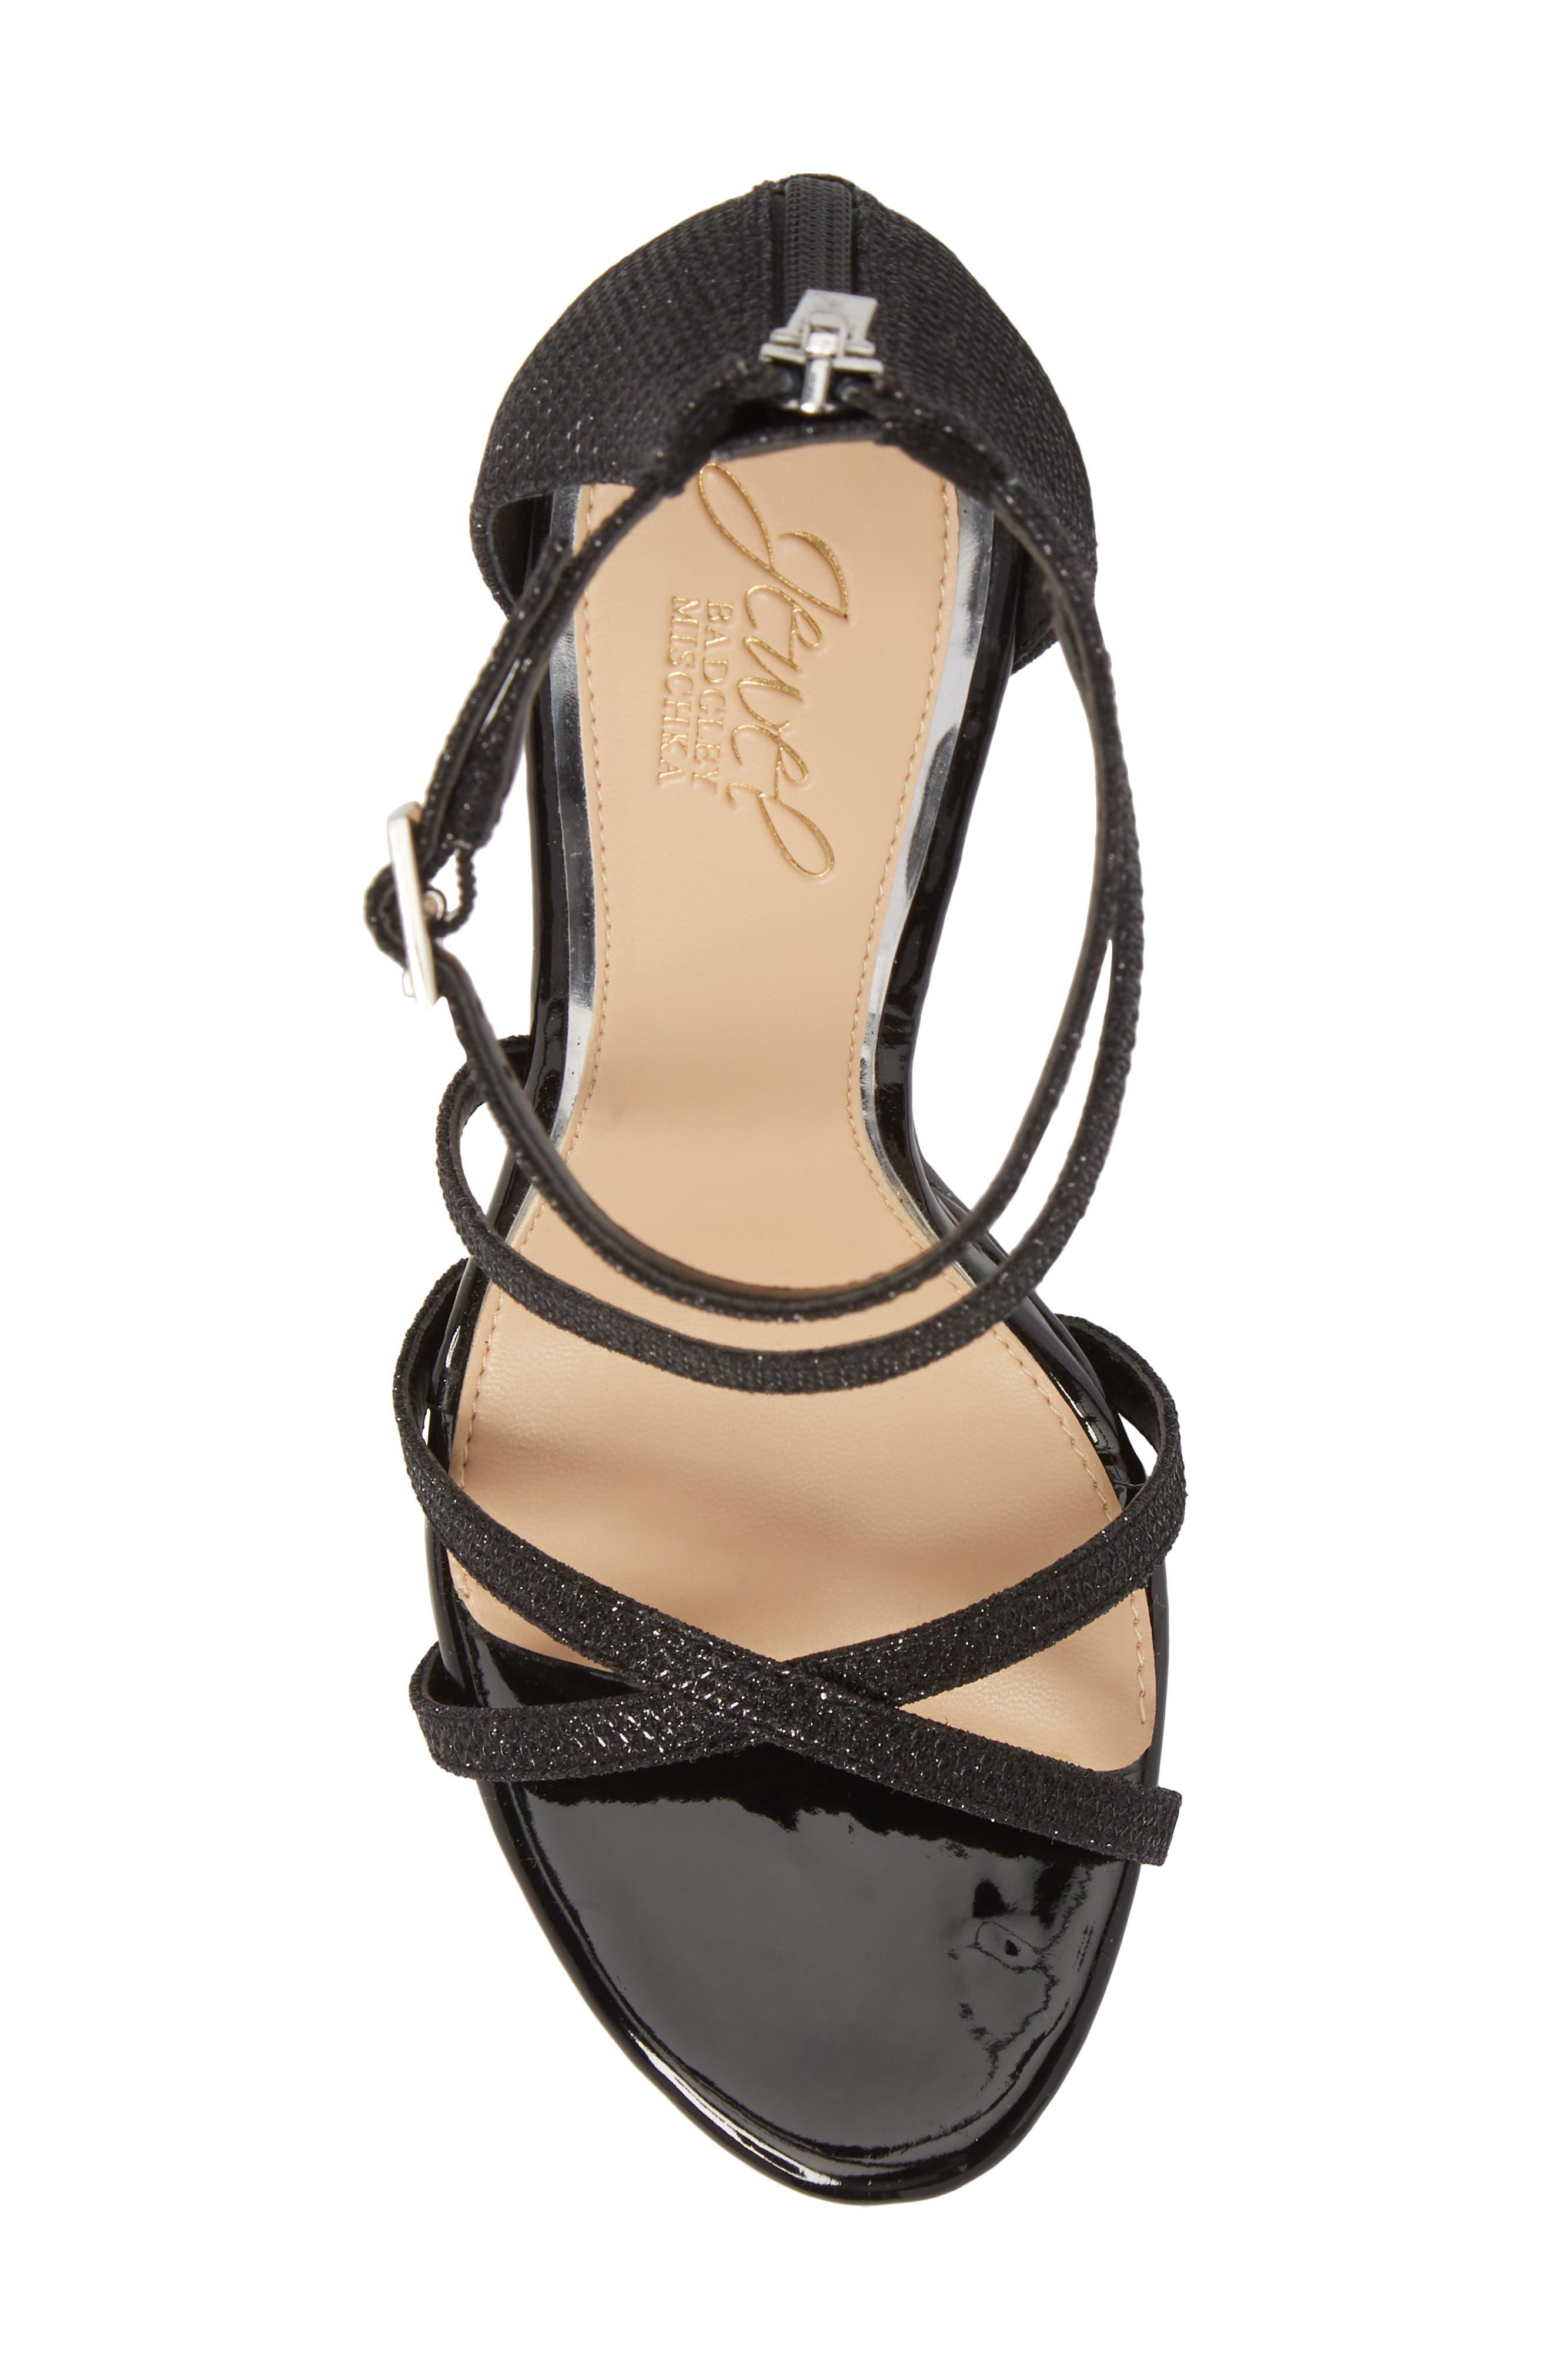 JEWEL BADGLEY MISCHKA, Galen Strappy Platform Sandal, Alternate thumbnail 5, color, BLACK GLITTER FABRIC